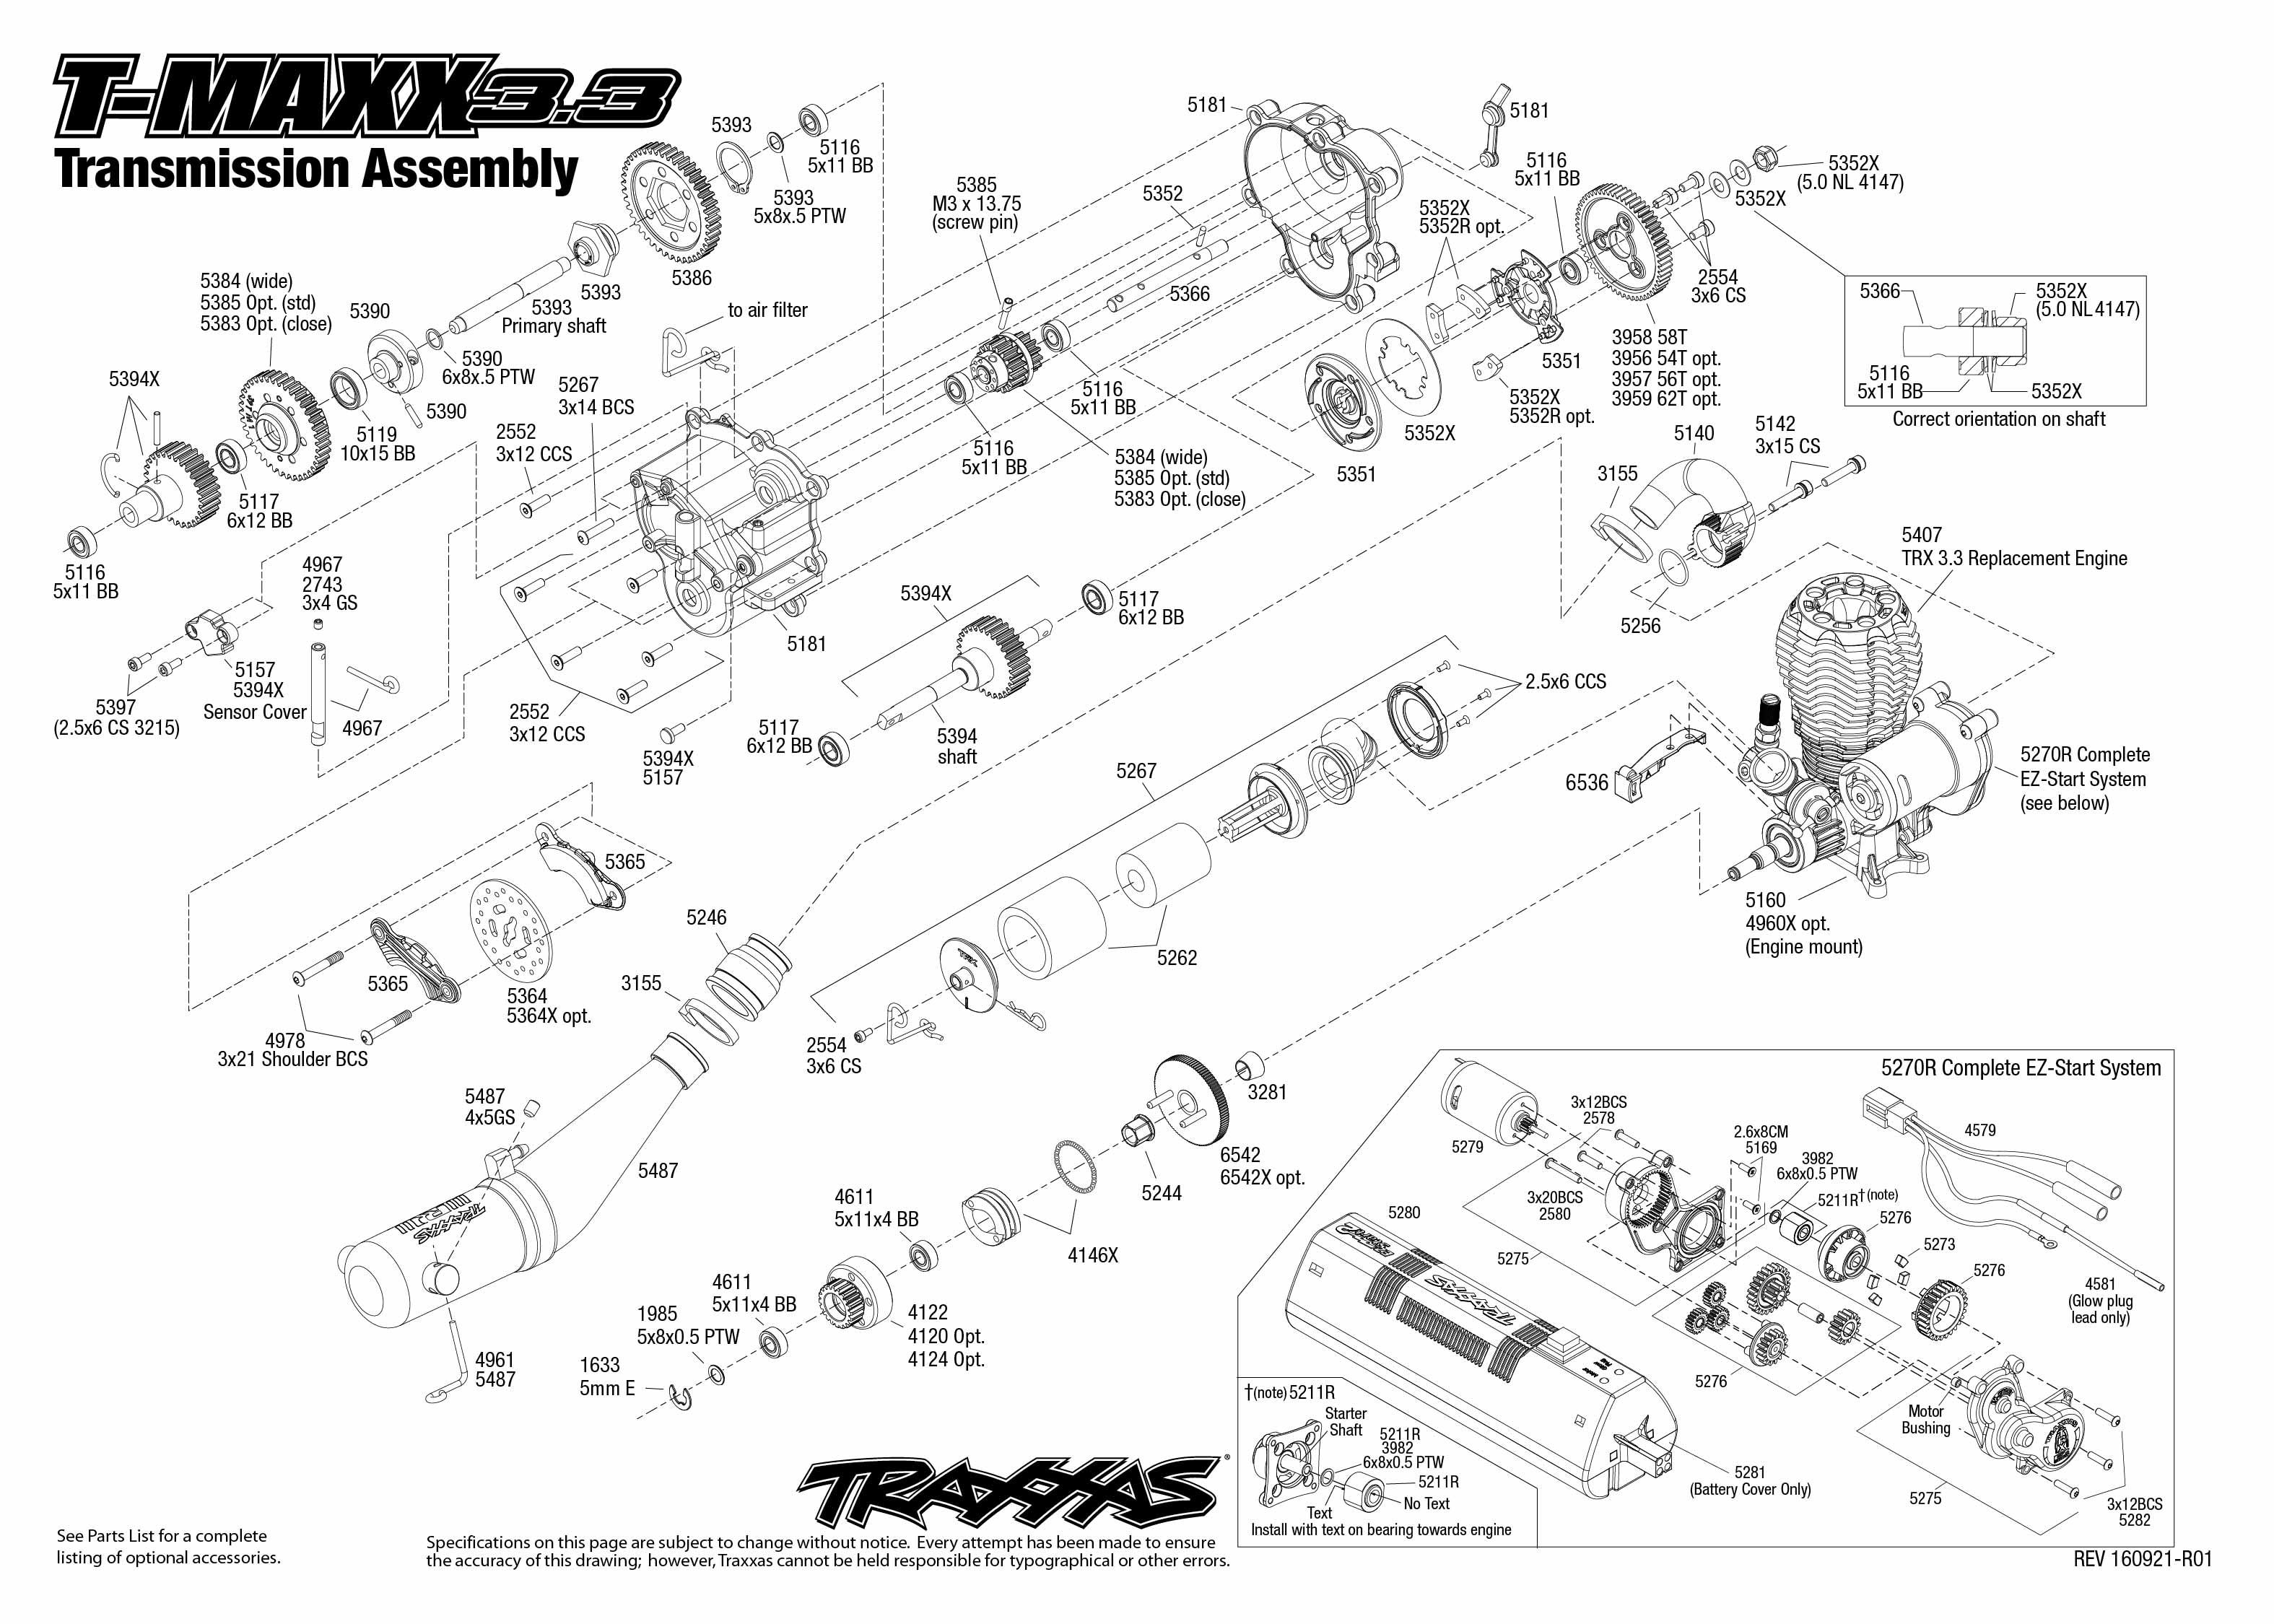 traxxas t maxx 3 parts diagram warehouse management process flow nitro monster rtr tsm eurorc